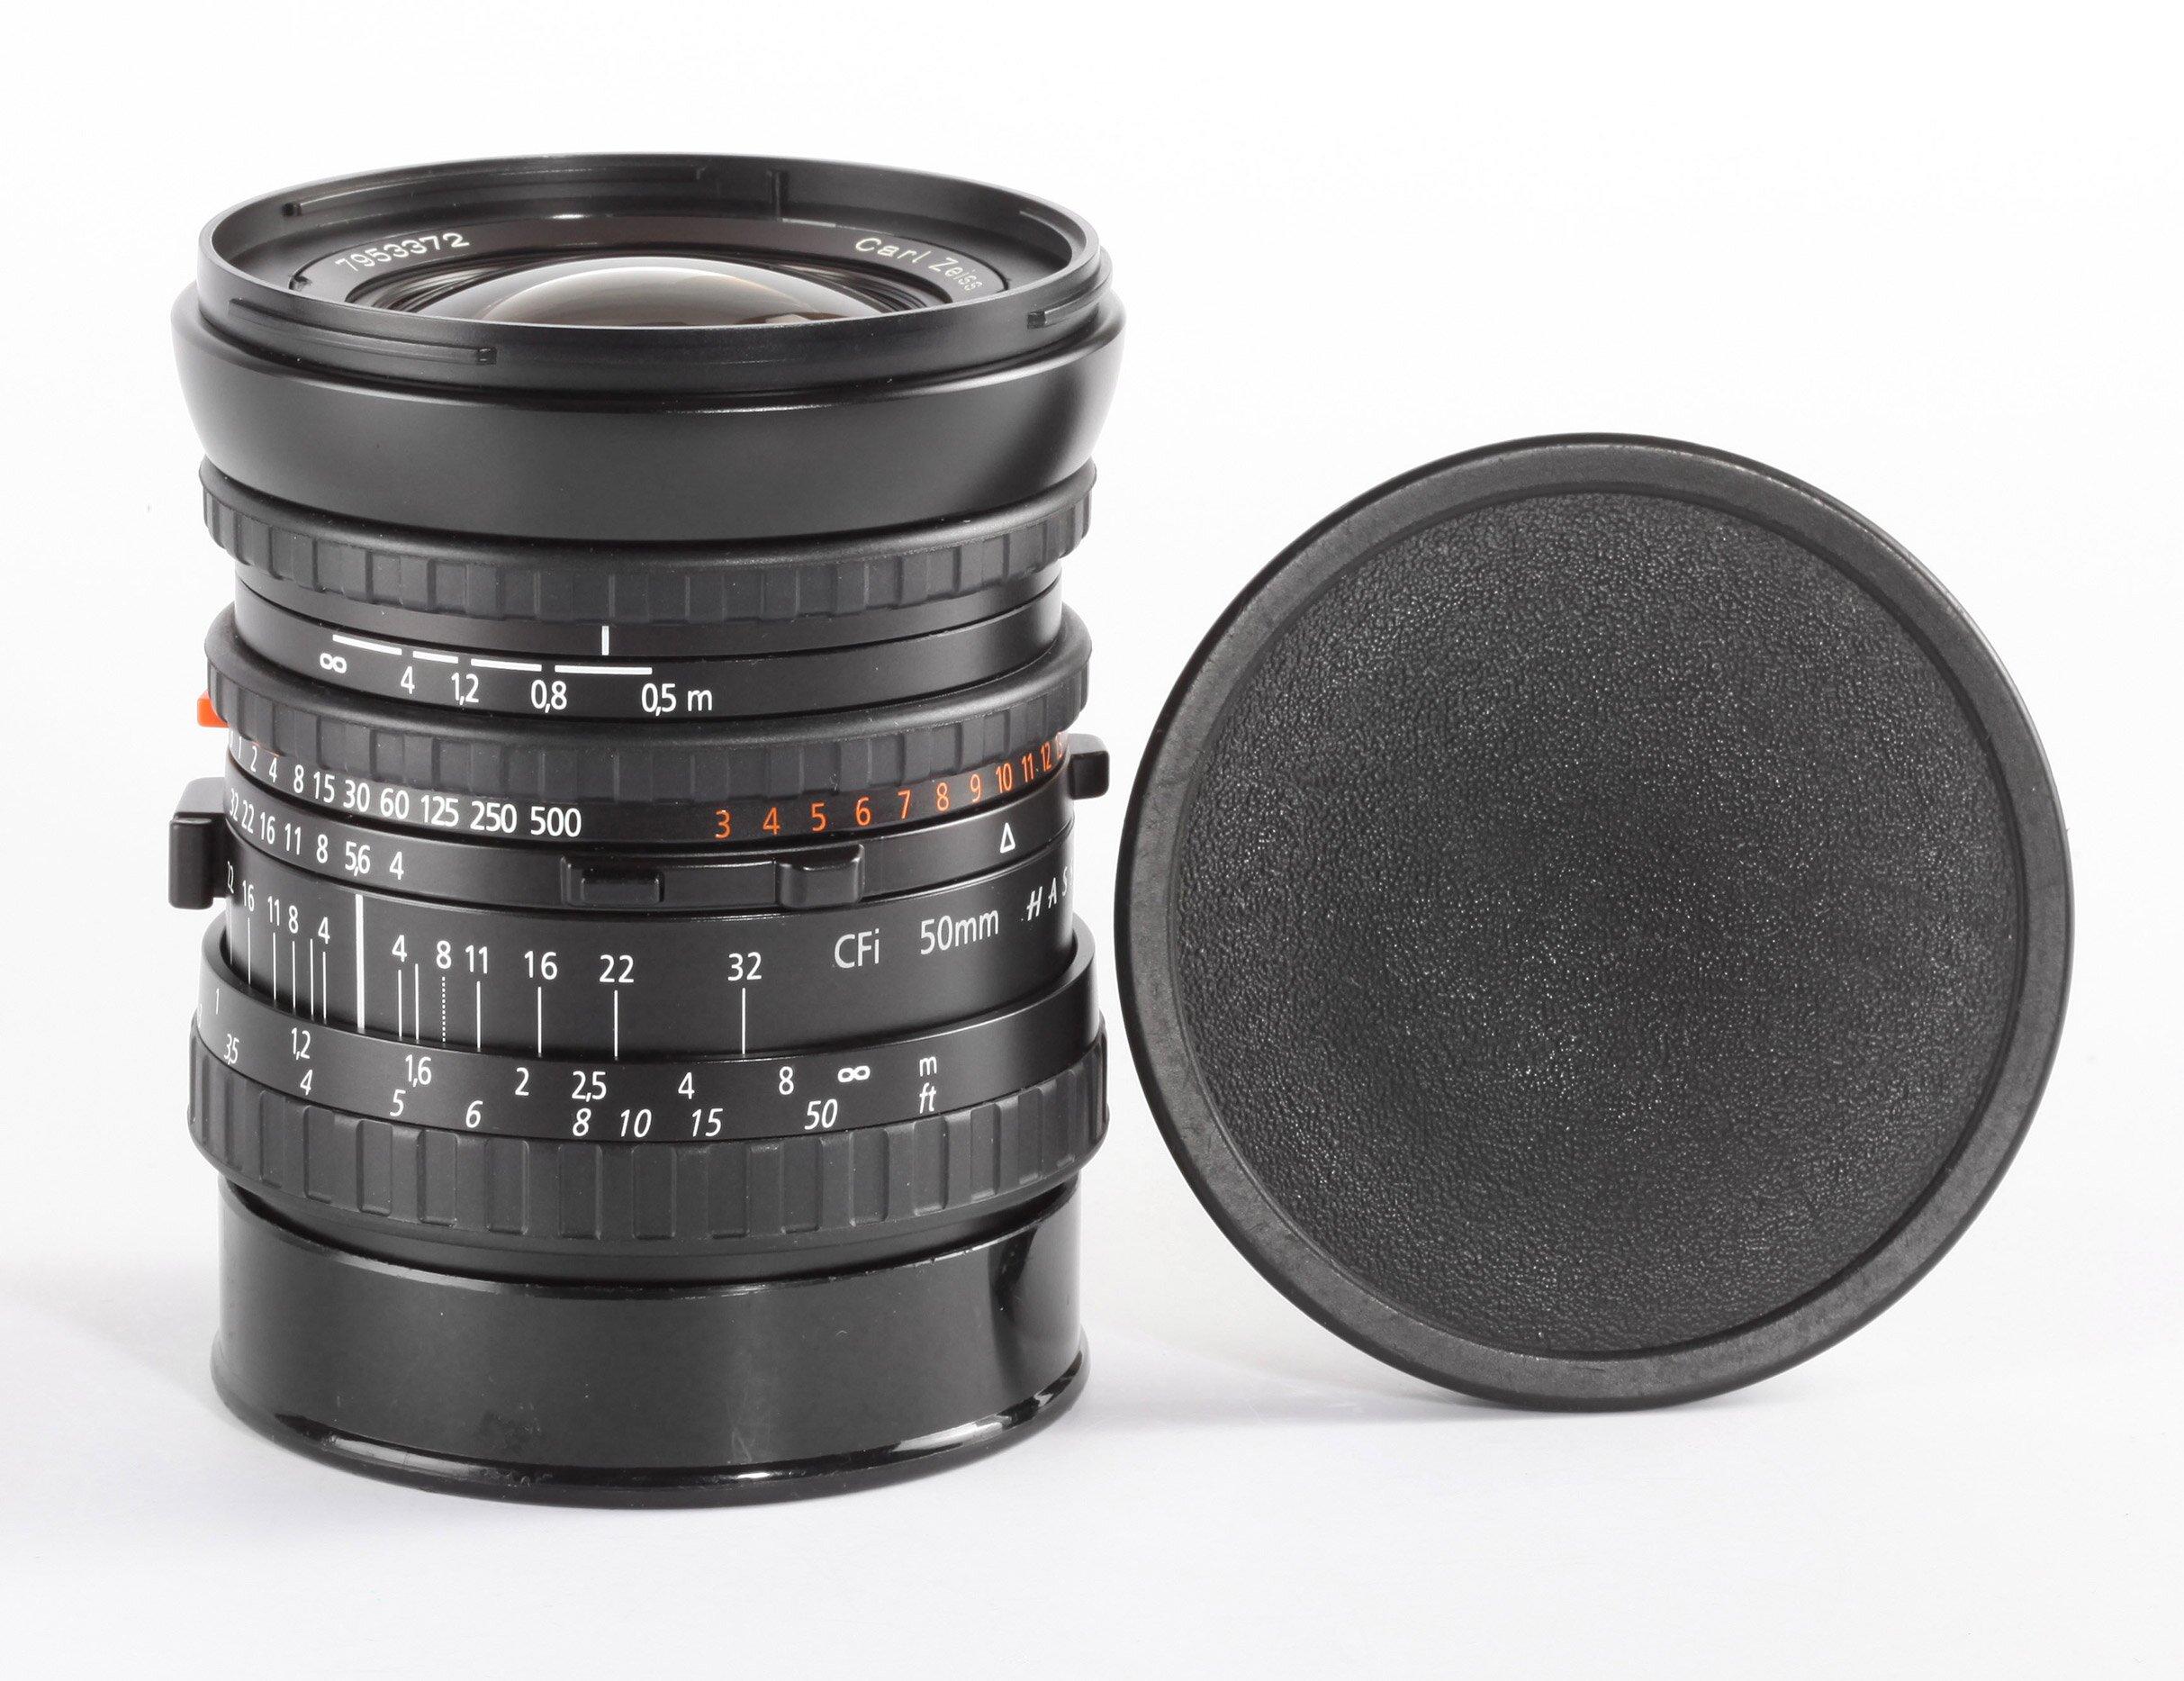 Hasselblad CFi Distagon 4/50mm T*